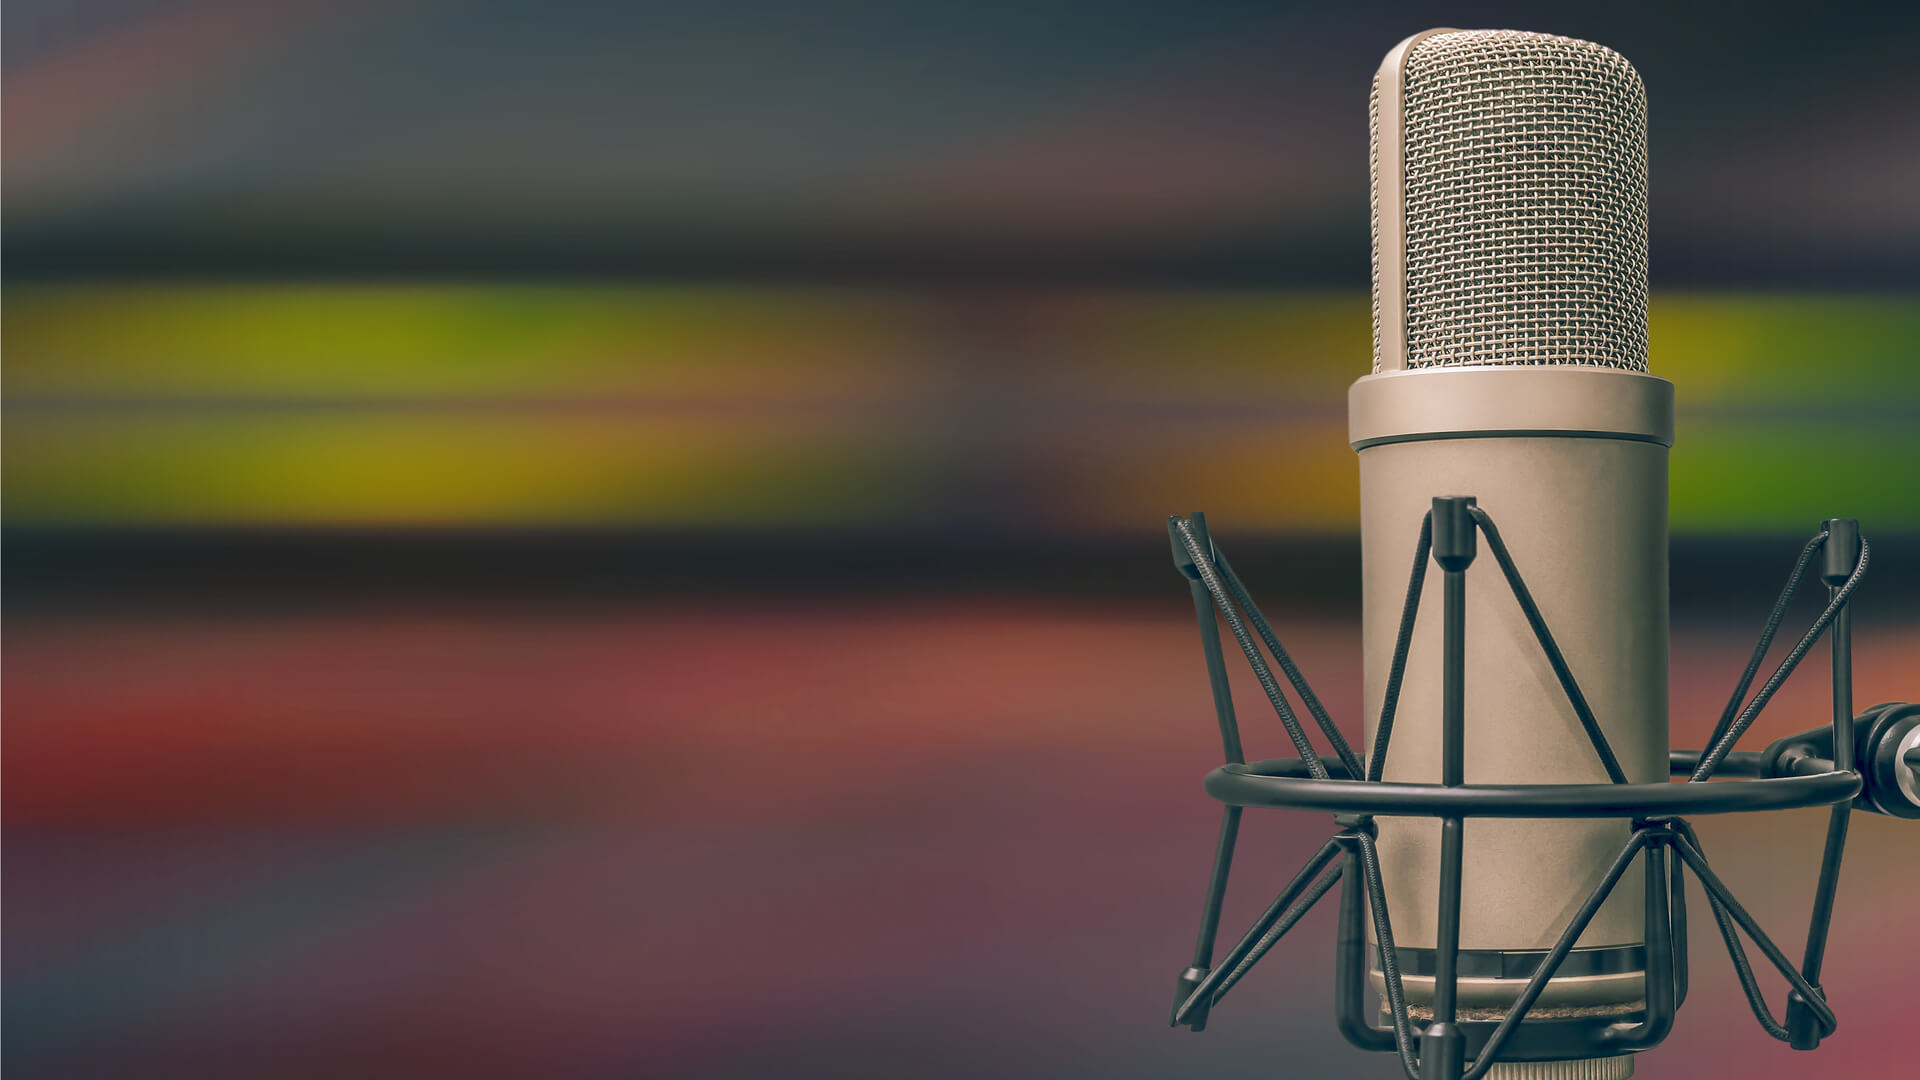 microphone-podcast-radio-ss-1920.jpg